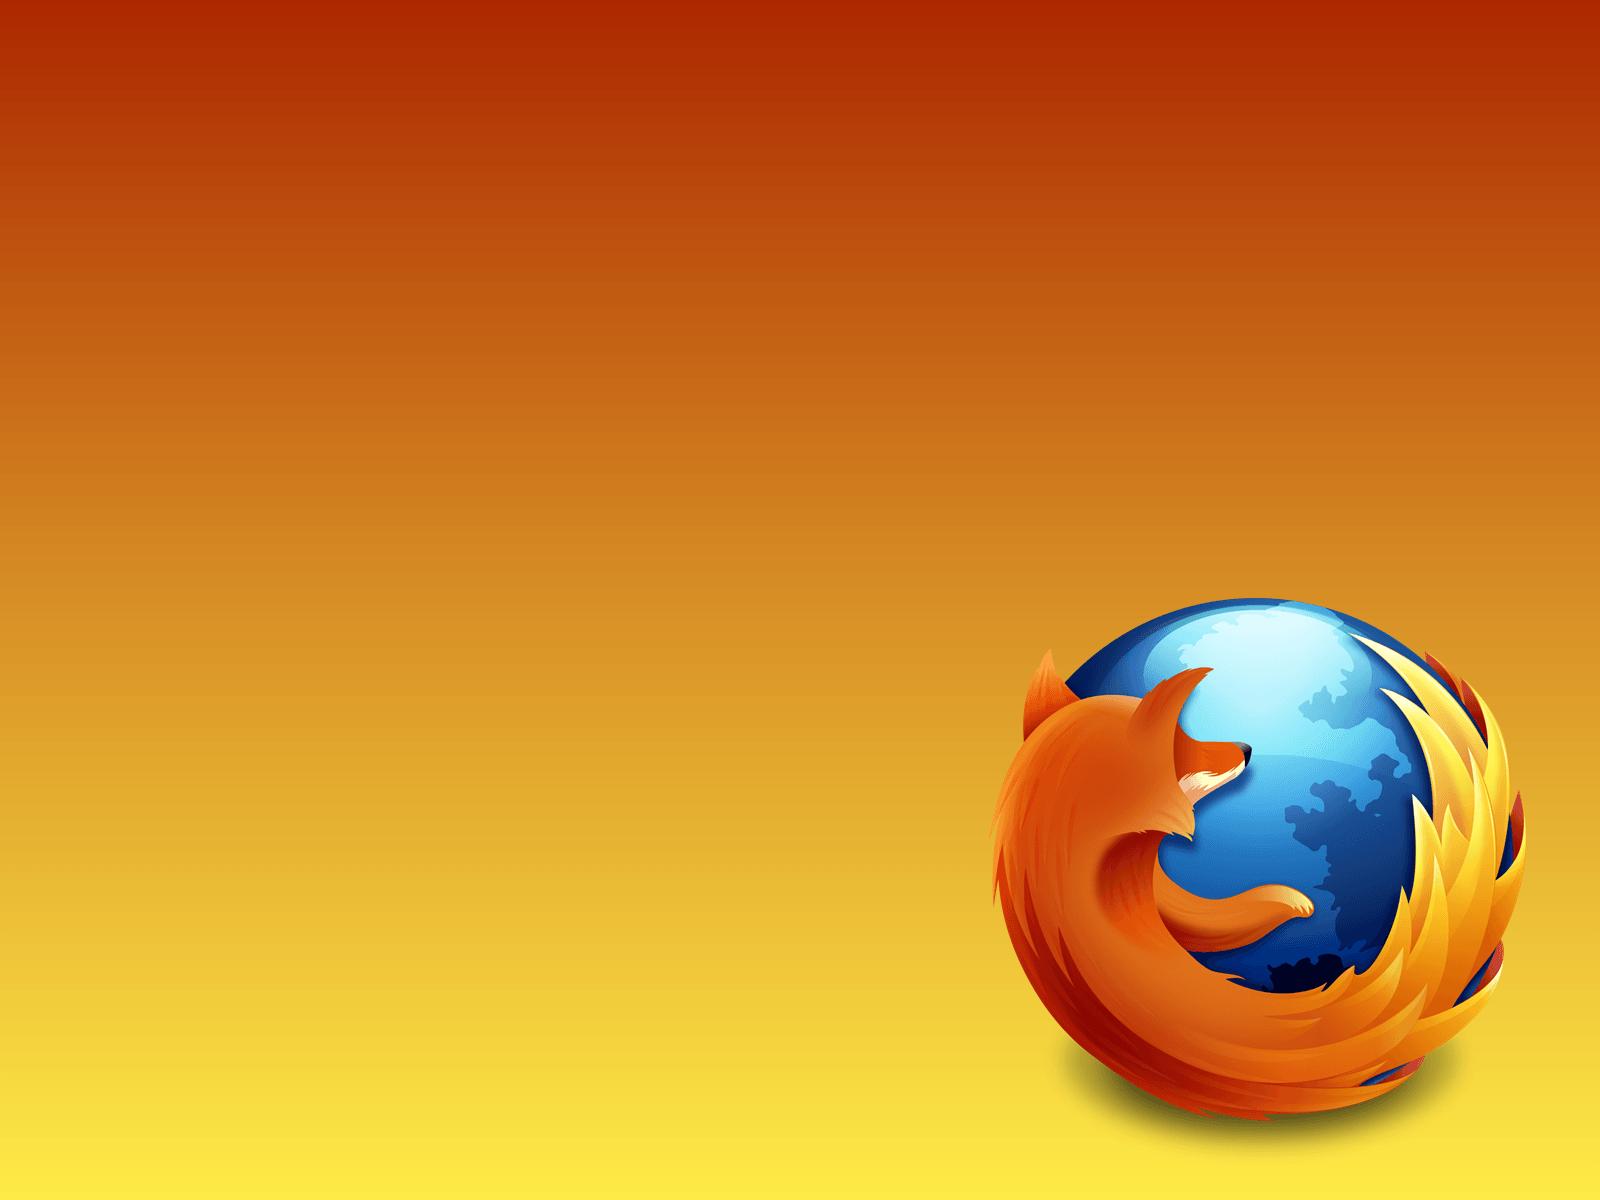 Human Fall Flat Wallpaper Mozilla Firefox Backgrounds Wallpaper Cave